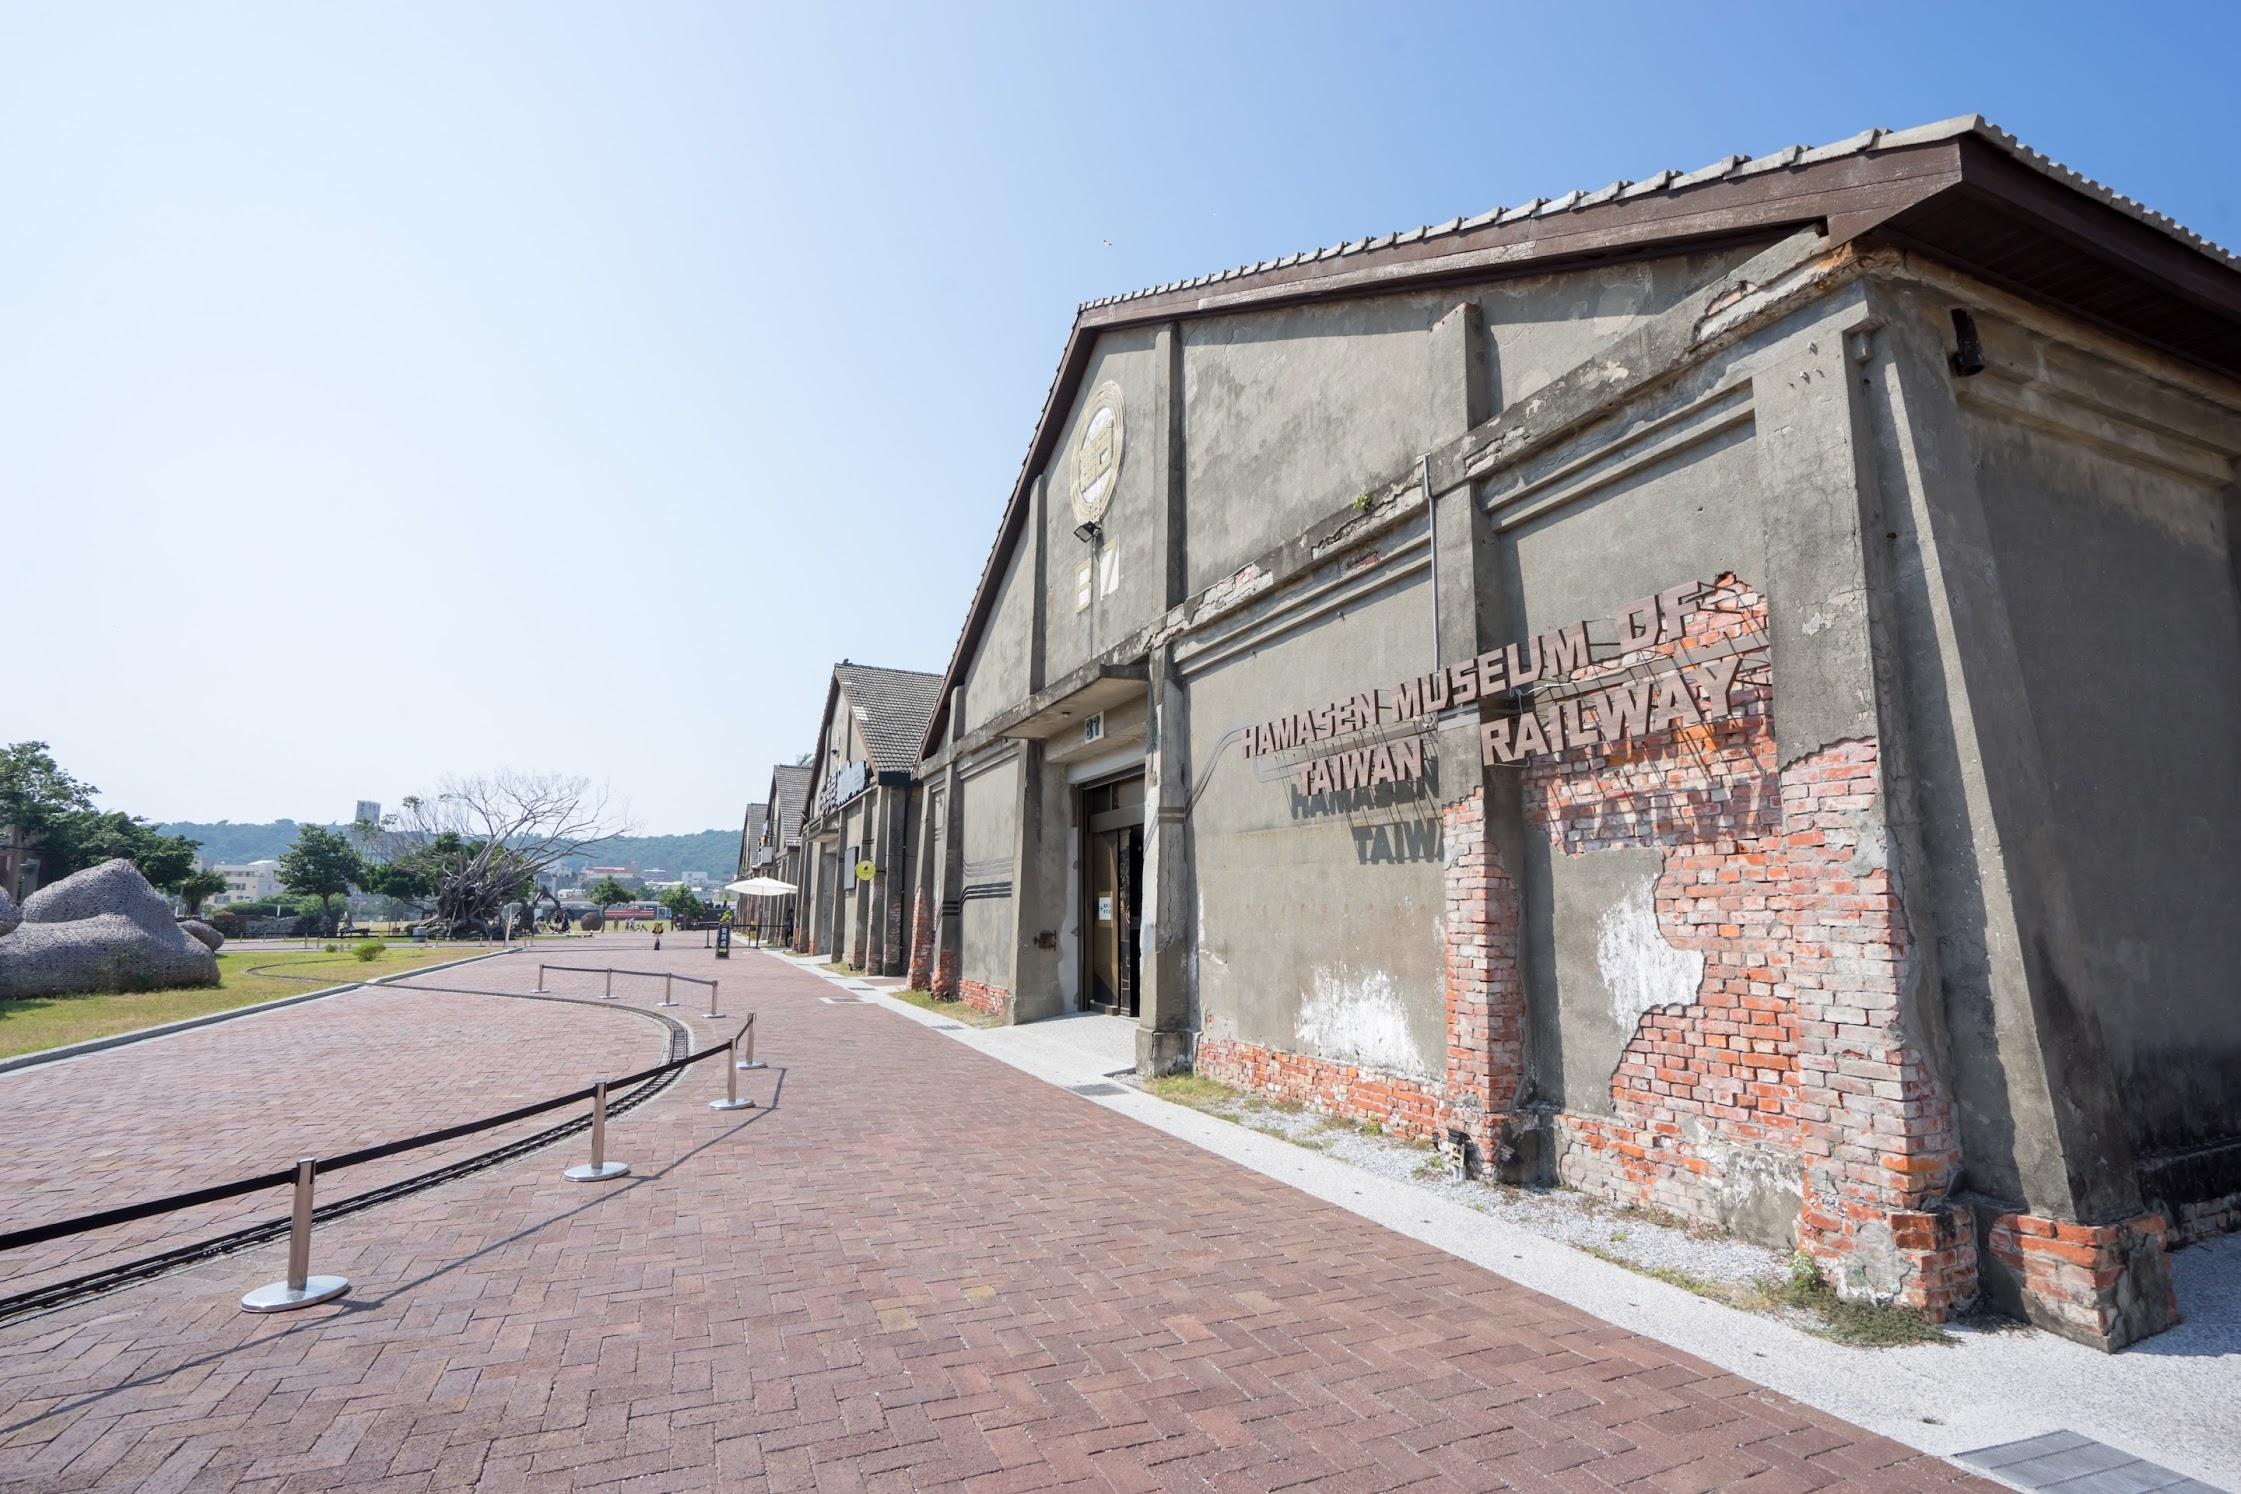 Kaohsiung Hamasen Museum of Taiwan Railway1